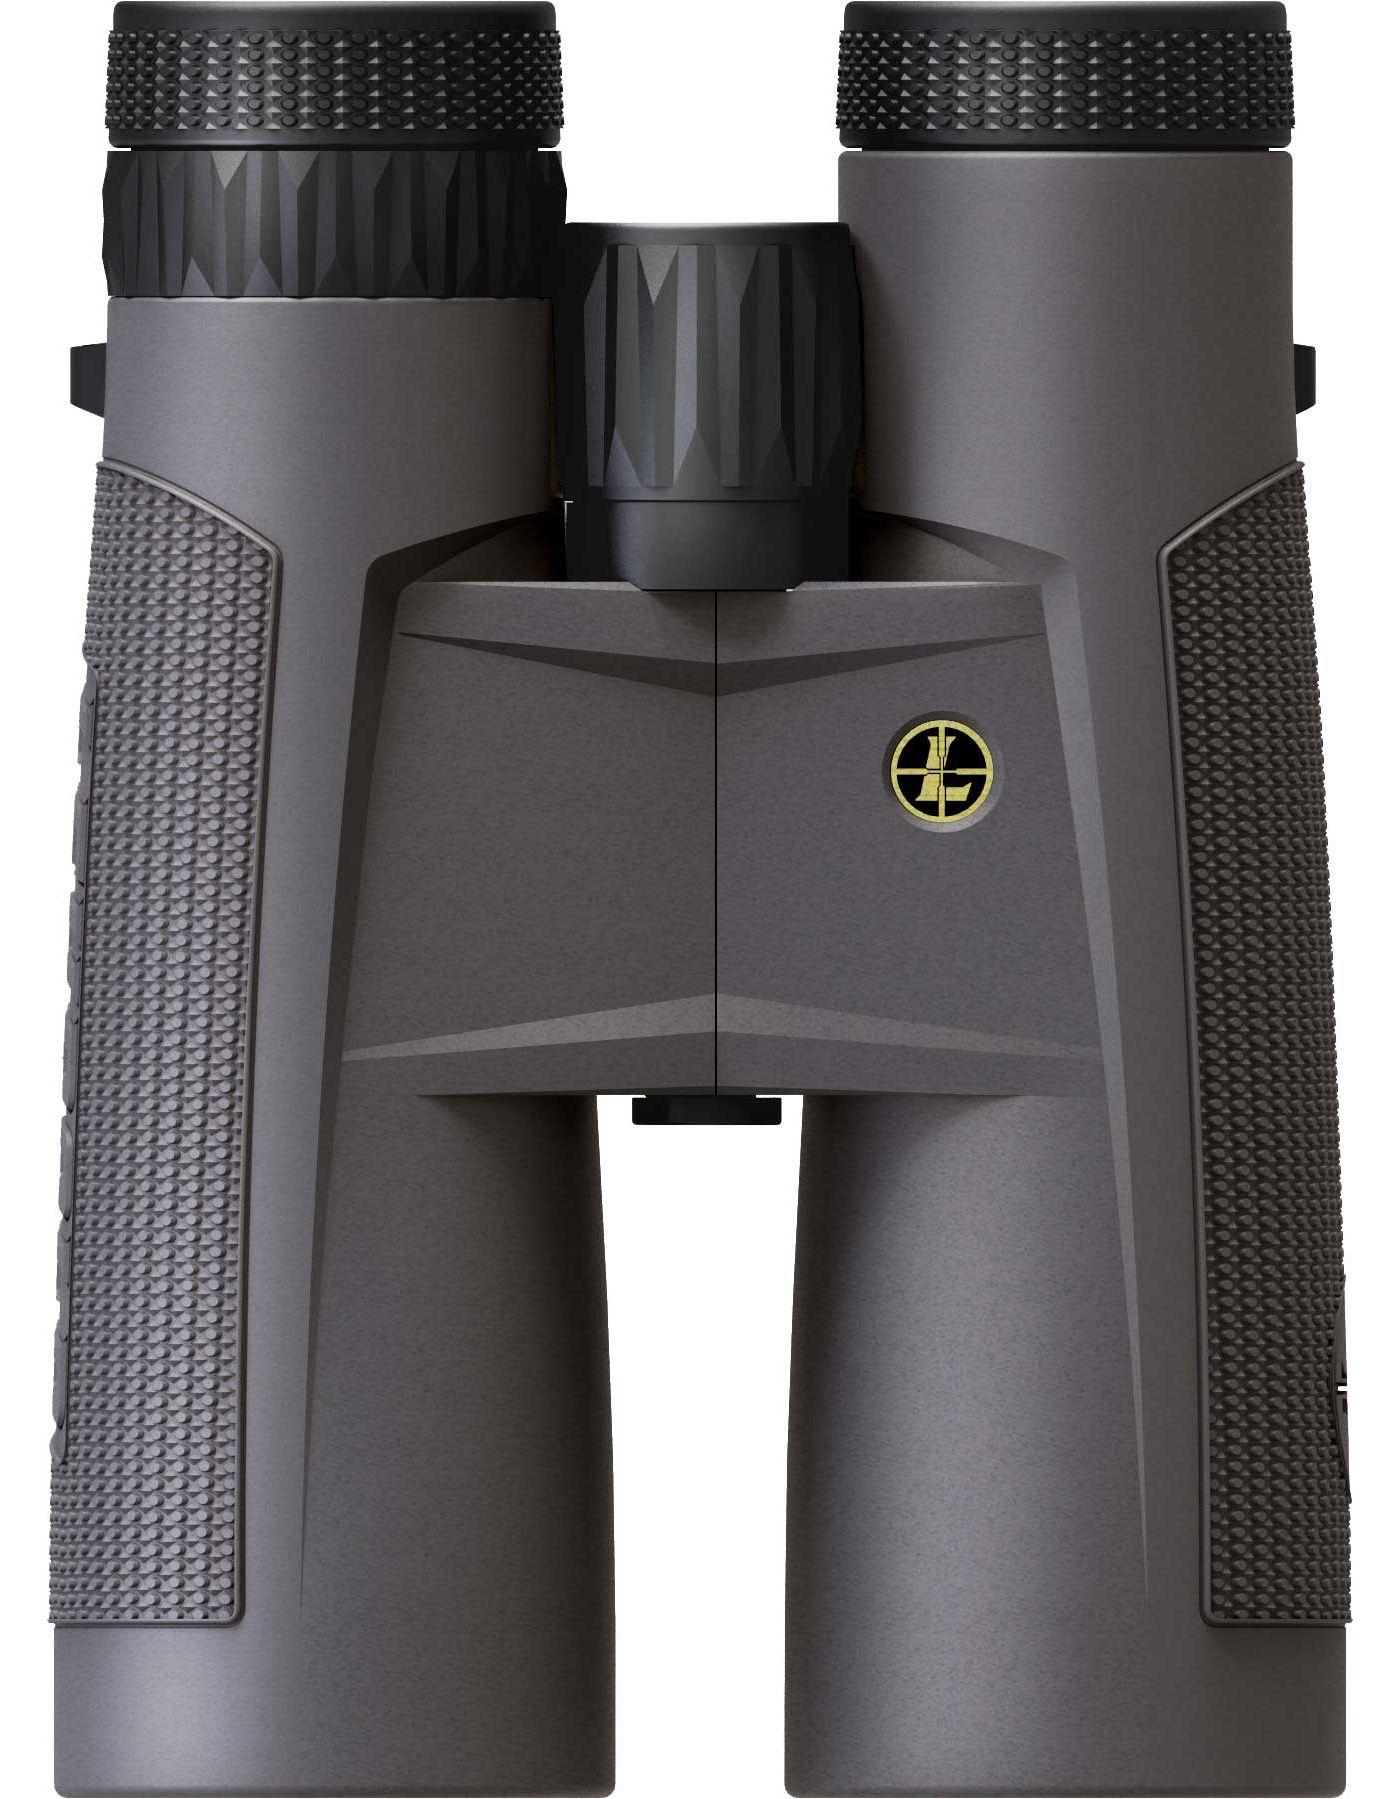 Leupold BX-2 Tioga HD 10x50mm Binoculars